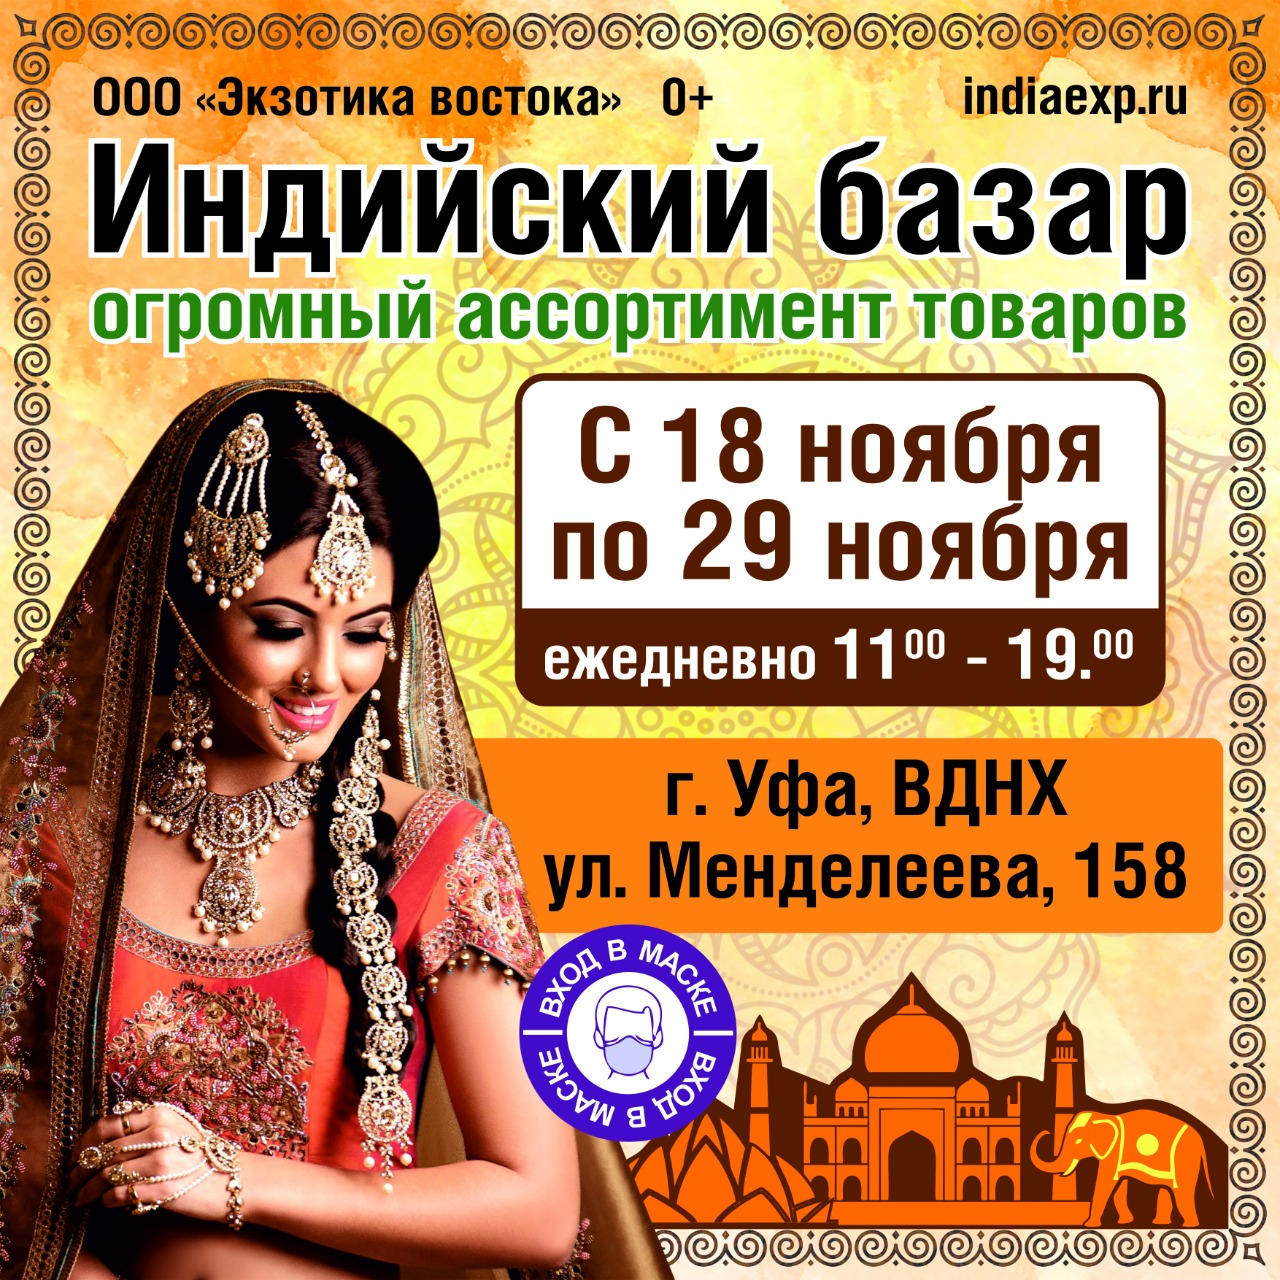 Индийский базар